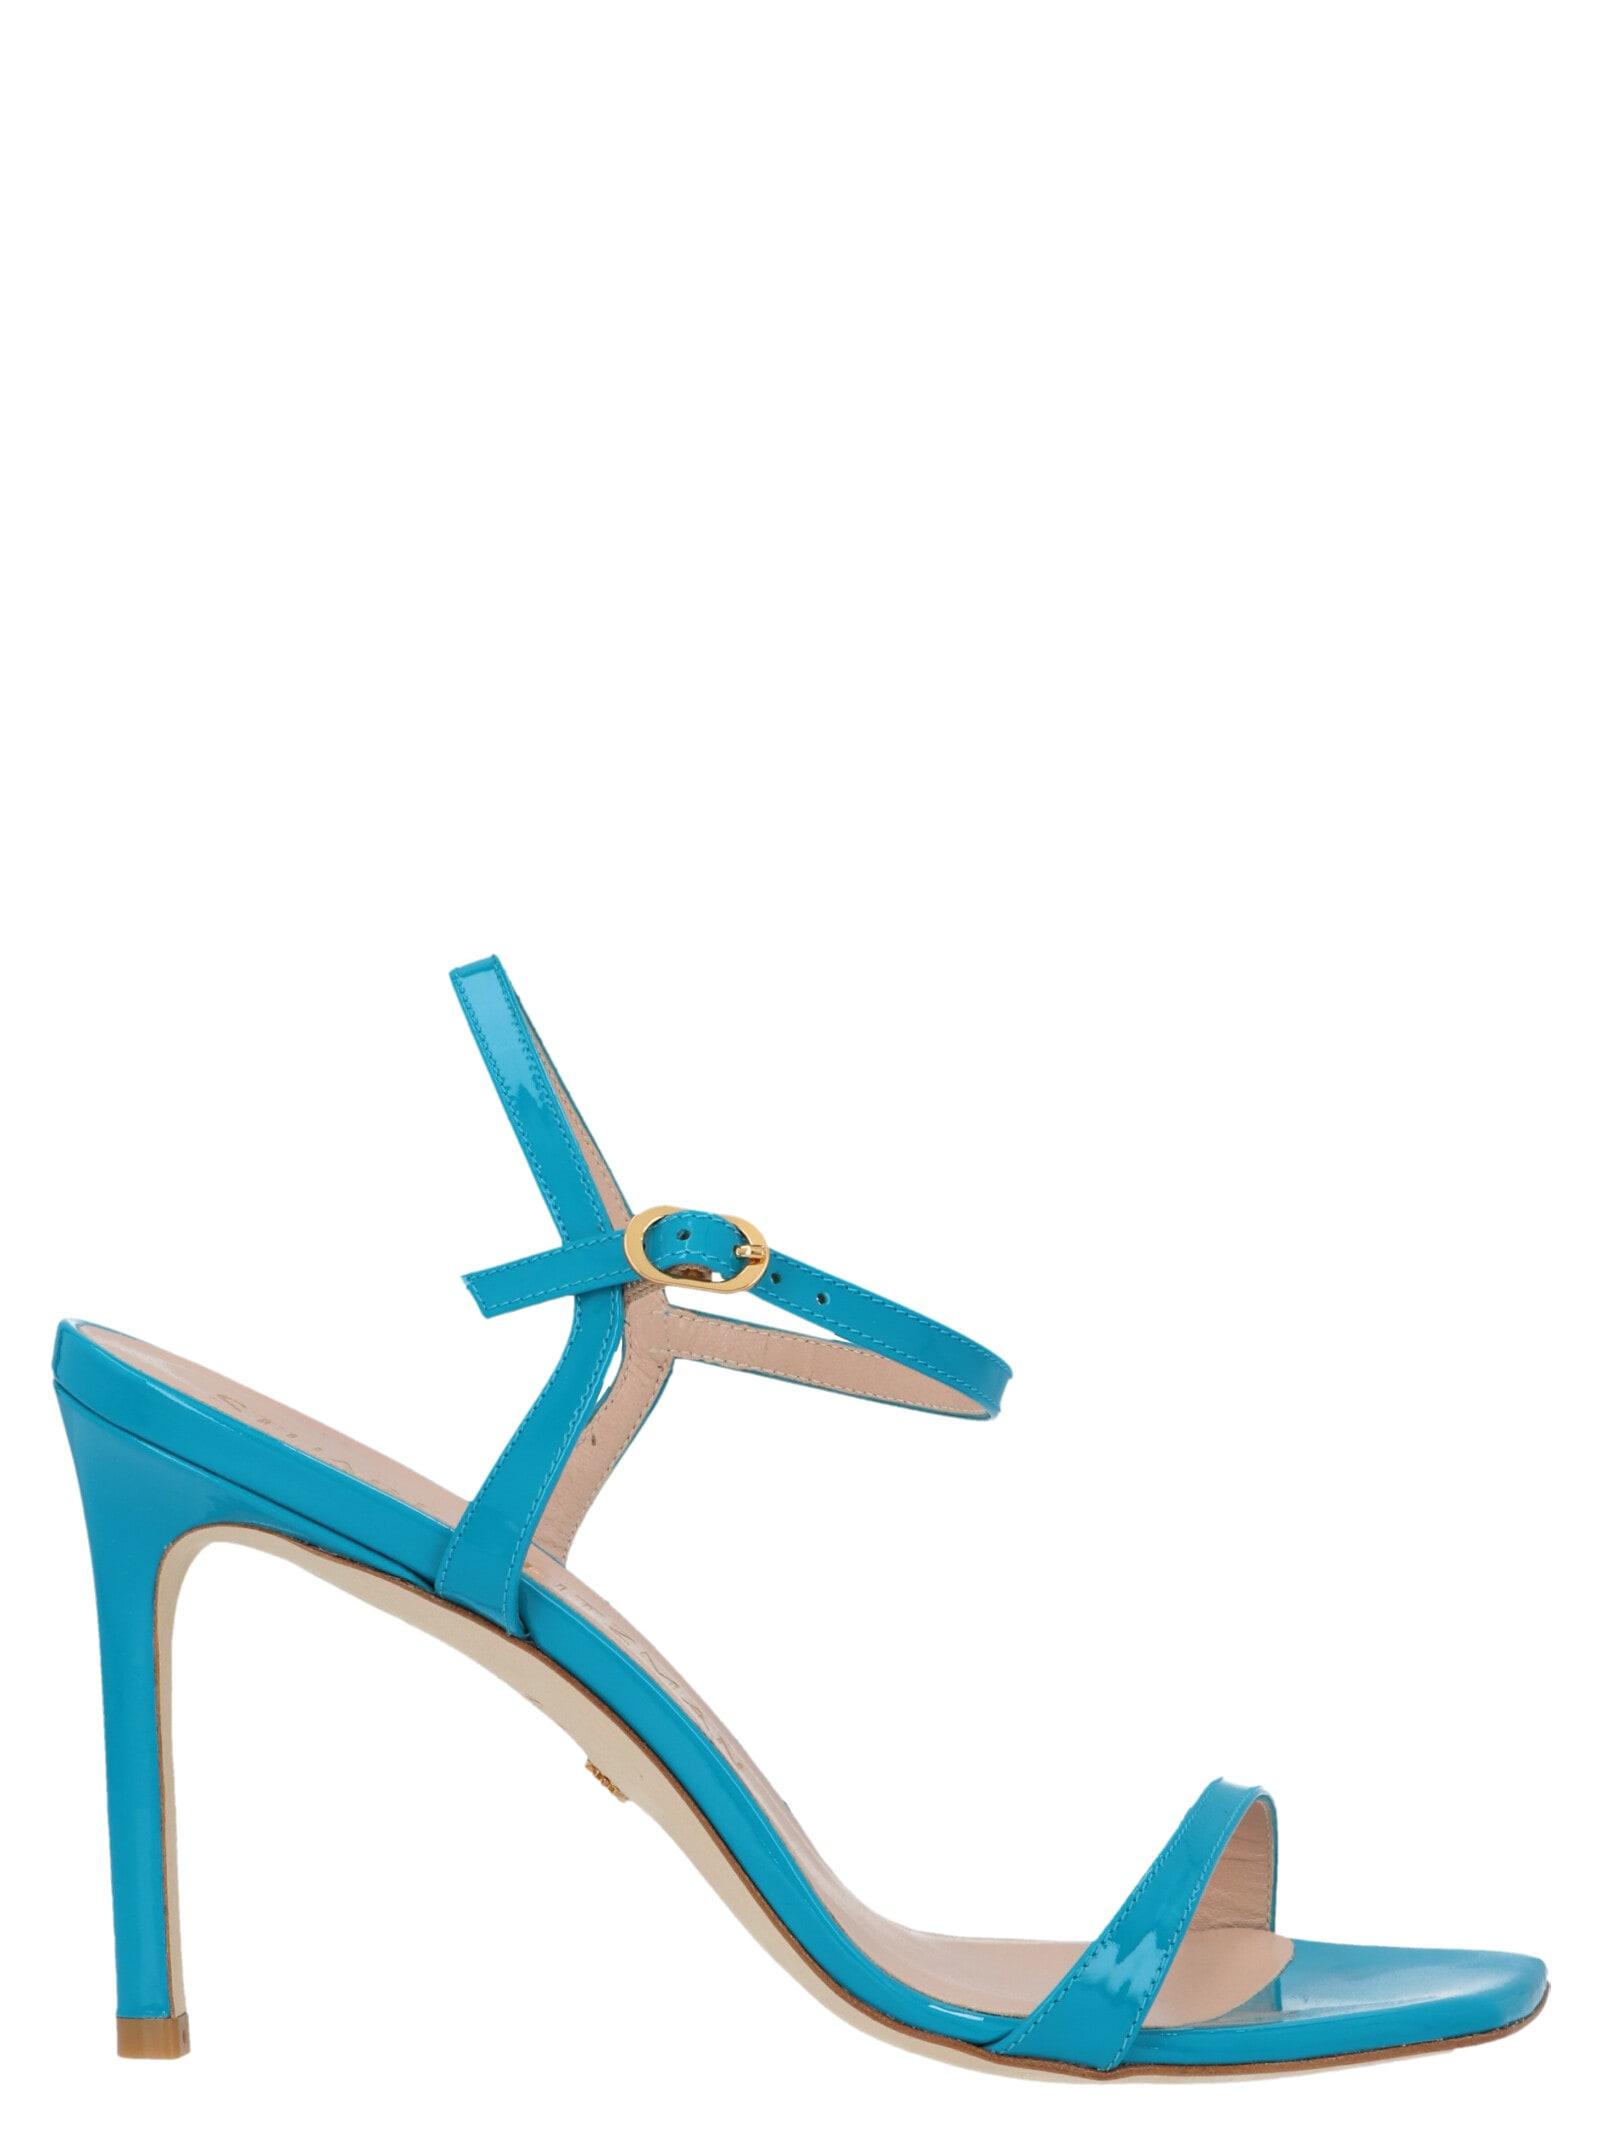 Stuart Weitzman alonza Shoes